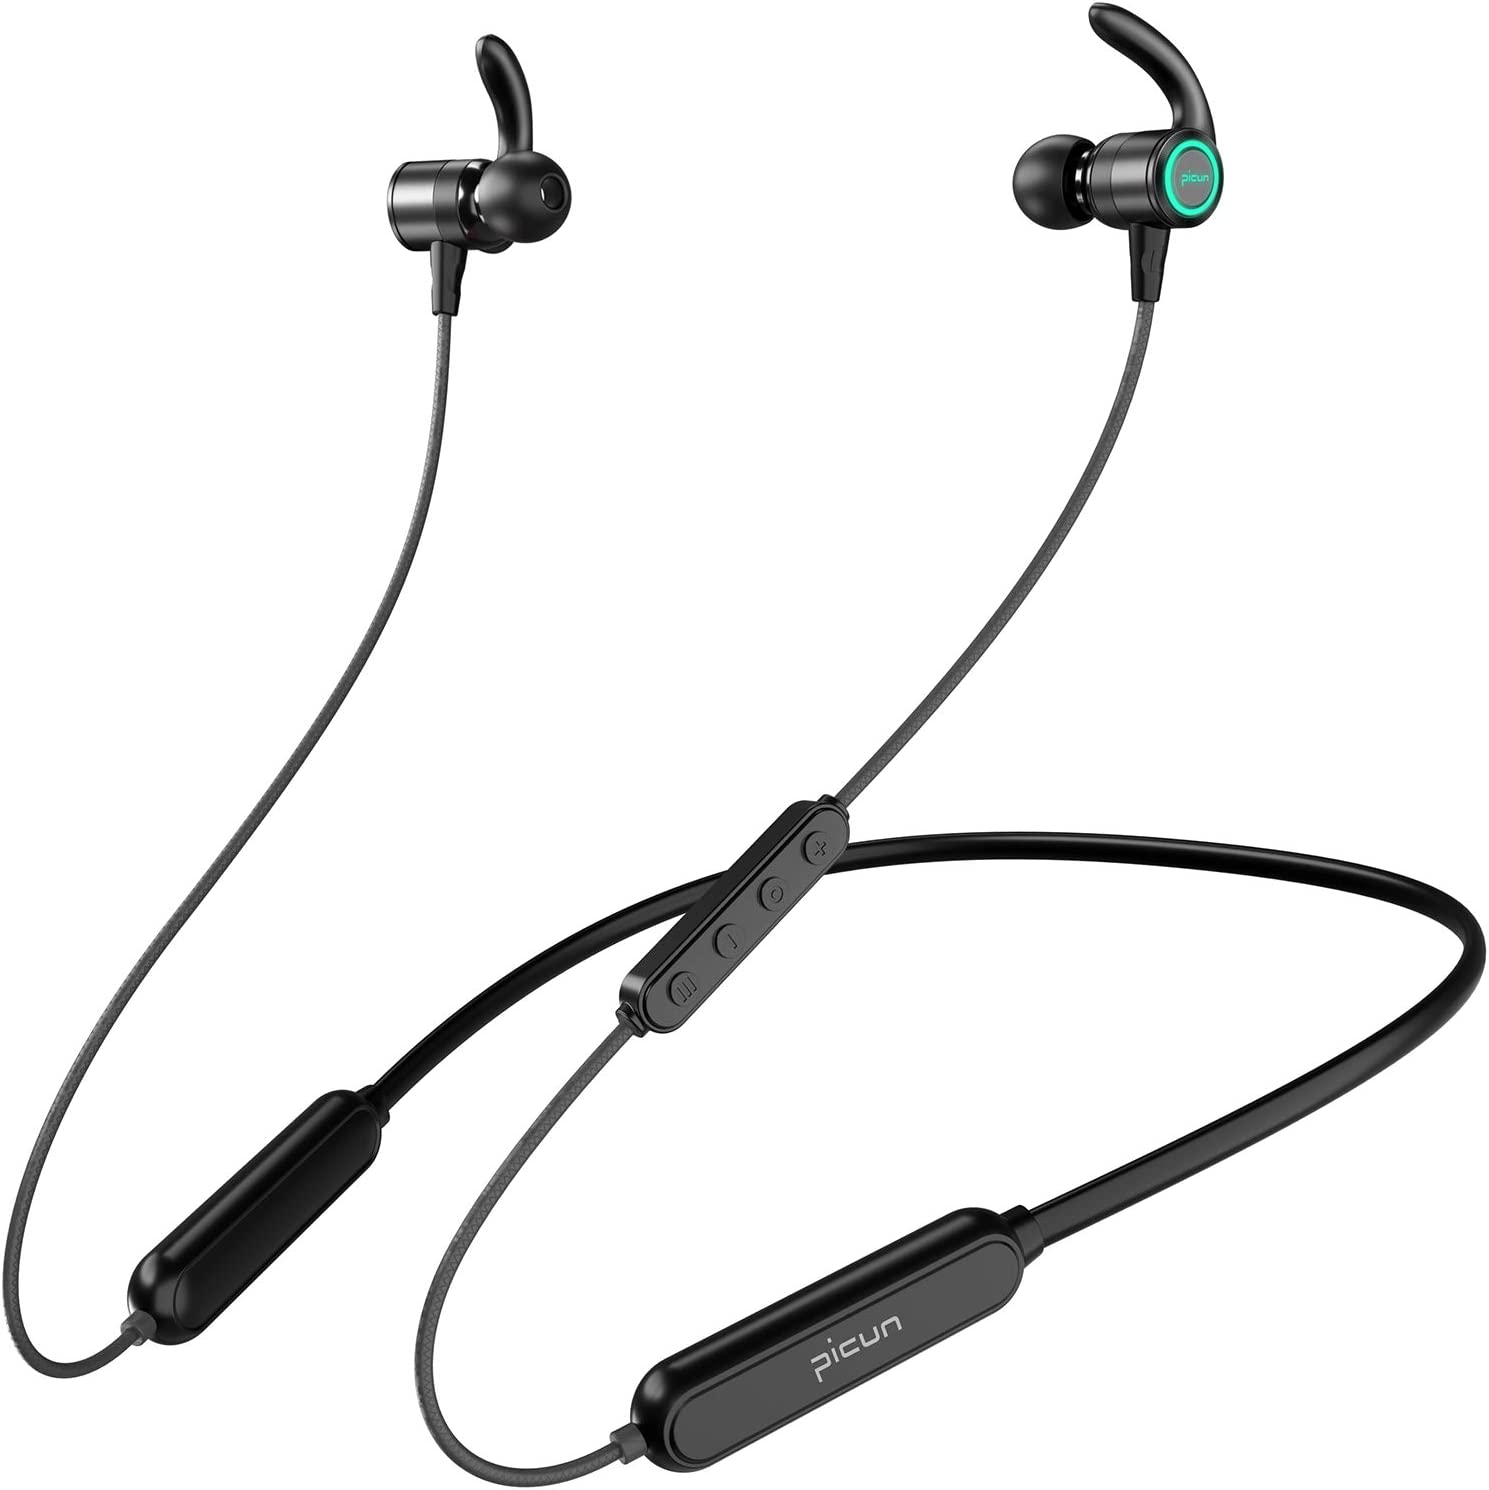 Picun Wireless Headphones 35H Playtime Neckband Bluetooth Headphones LED Light, HiFi Stereo IPX7 Waterproof Wireless Sport Earbuds w Mic, EQ Bass, Siri, Bluetooth5.0 Magnetic Running Earphones Workout